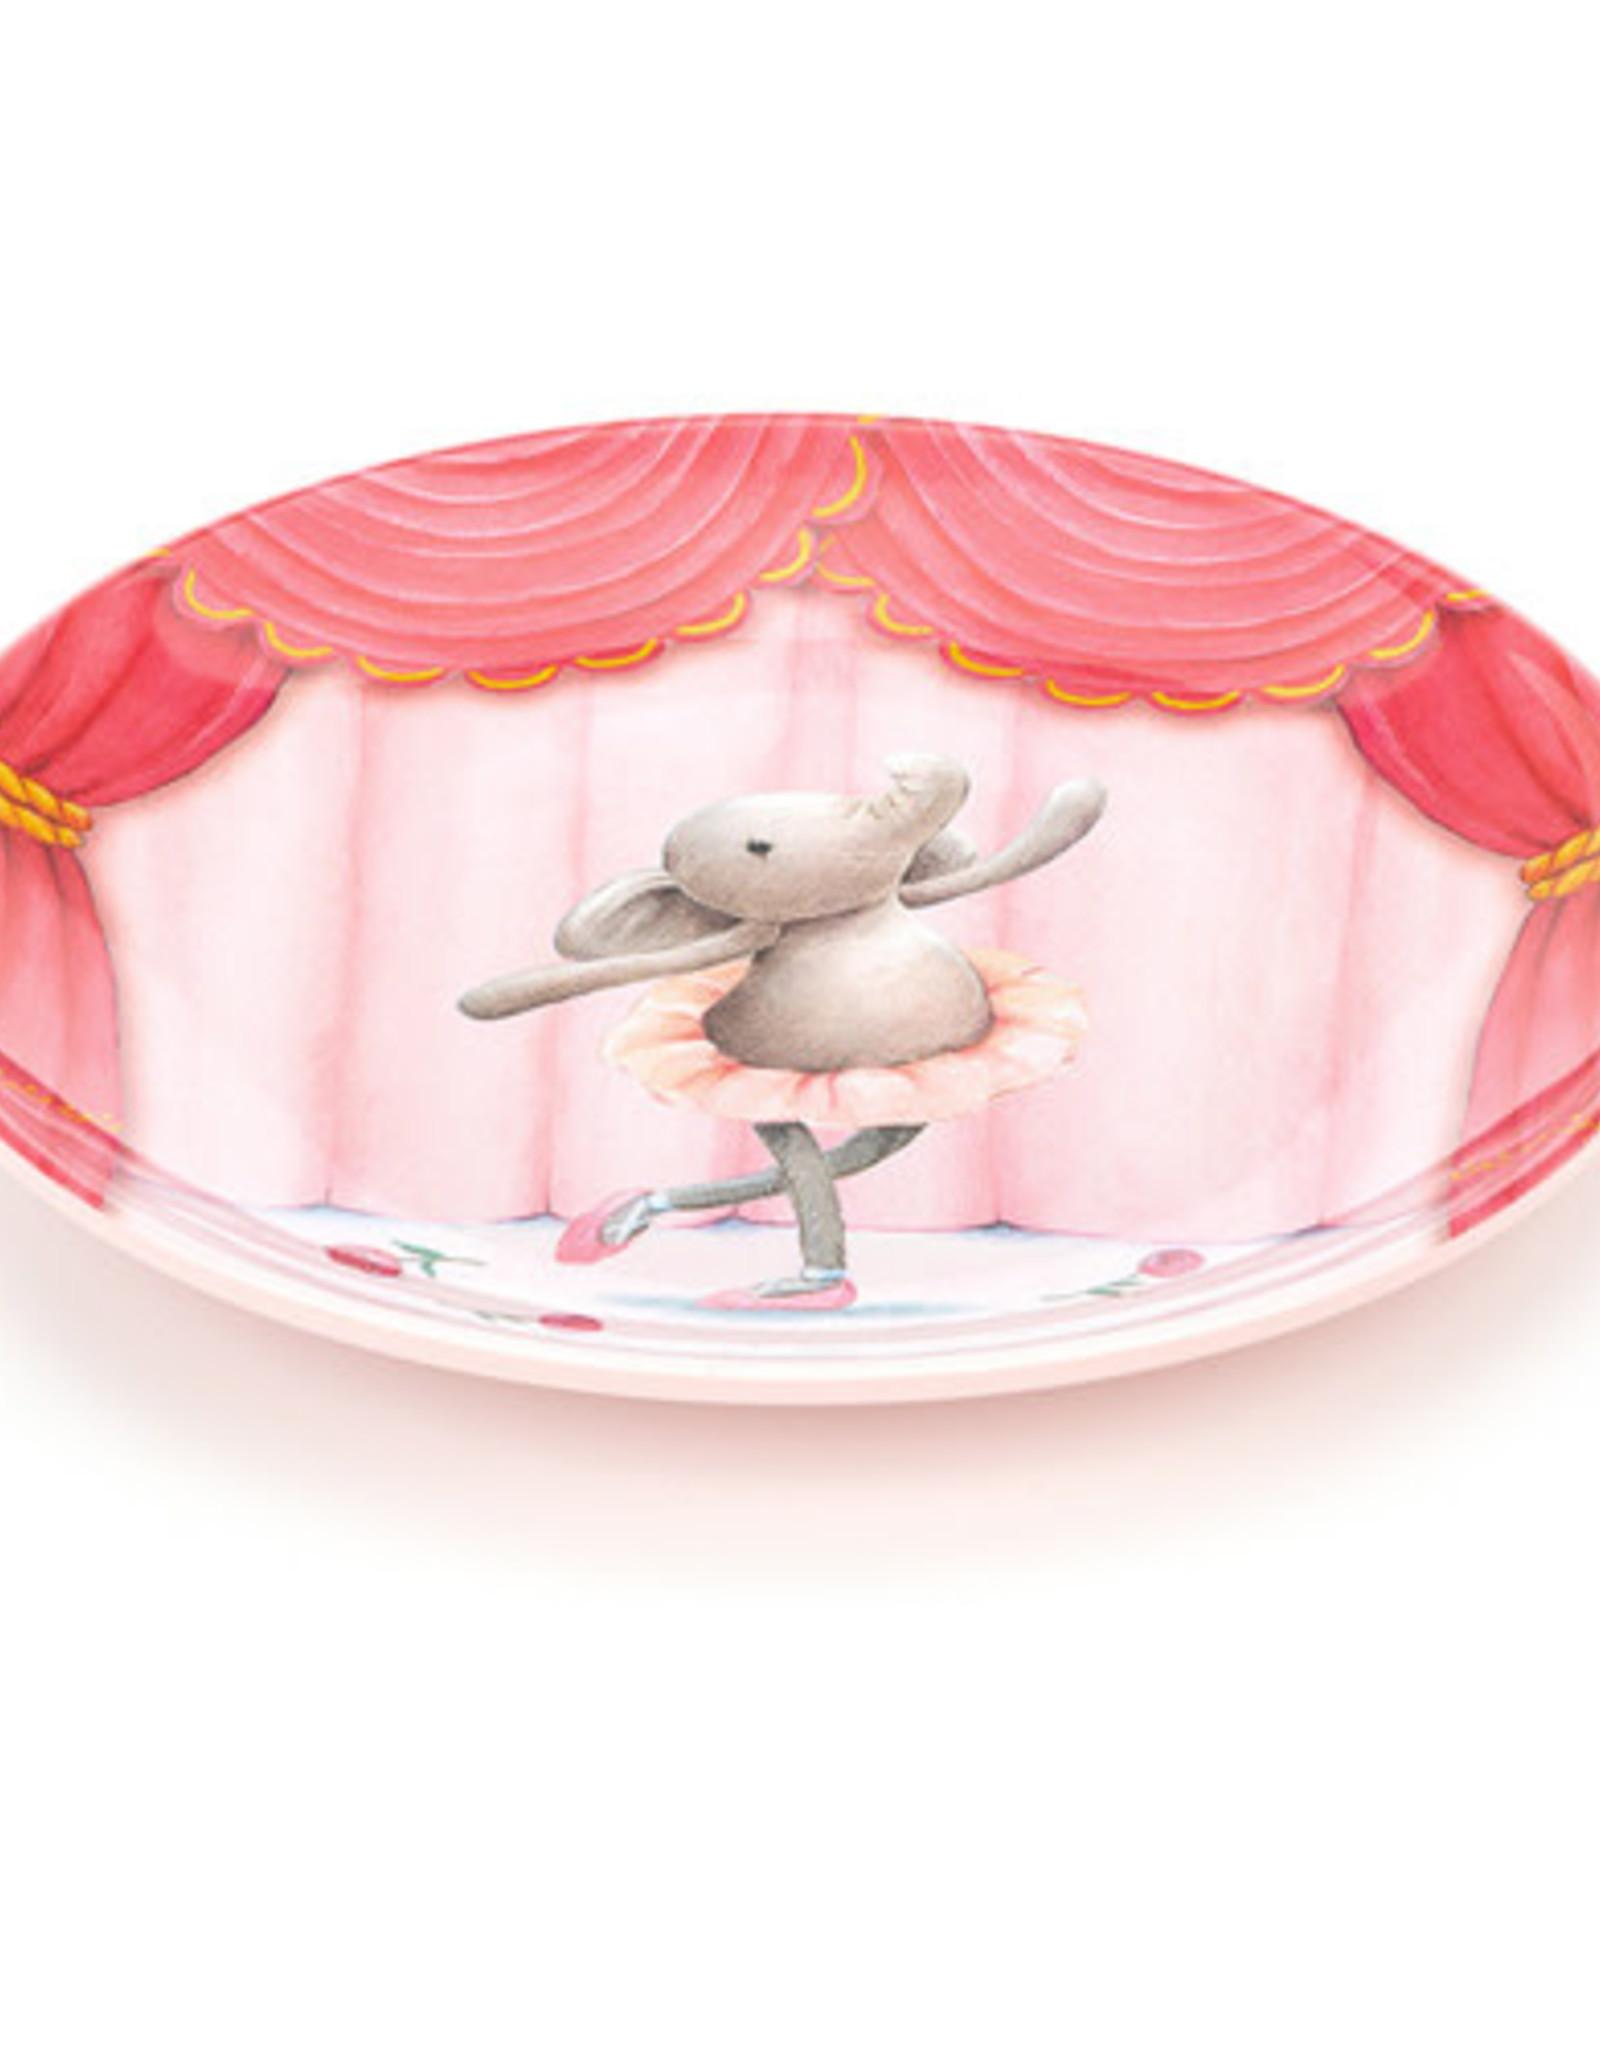 Jellycat Bord Elly Ballerina